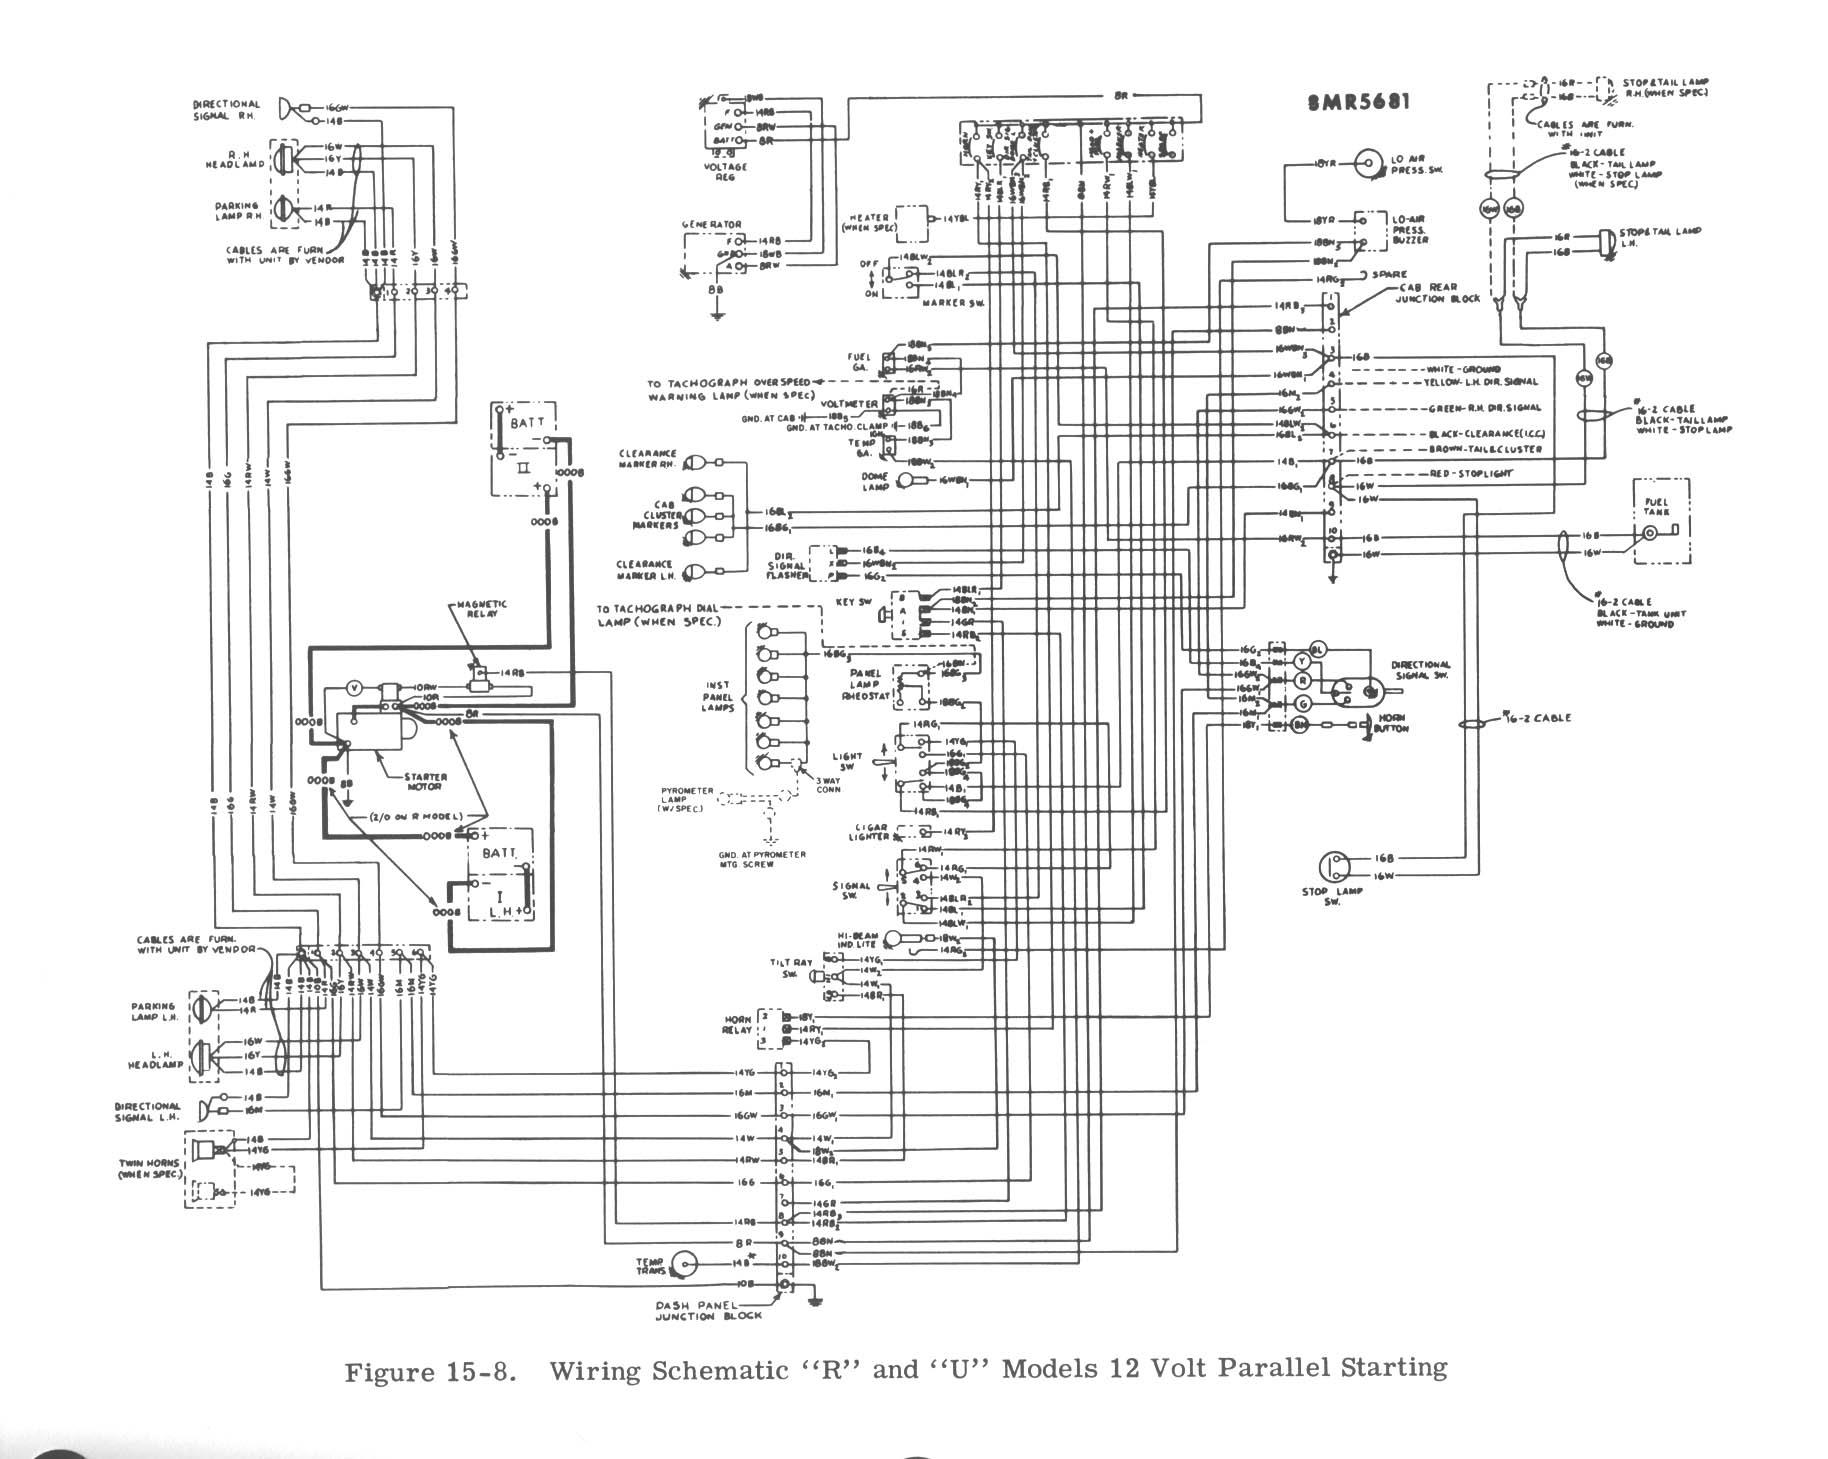 Mack Truck Wiring Diagram - Data Wiring Diagram Today - Mack Truck Wiring Diagram Free Download